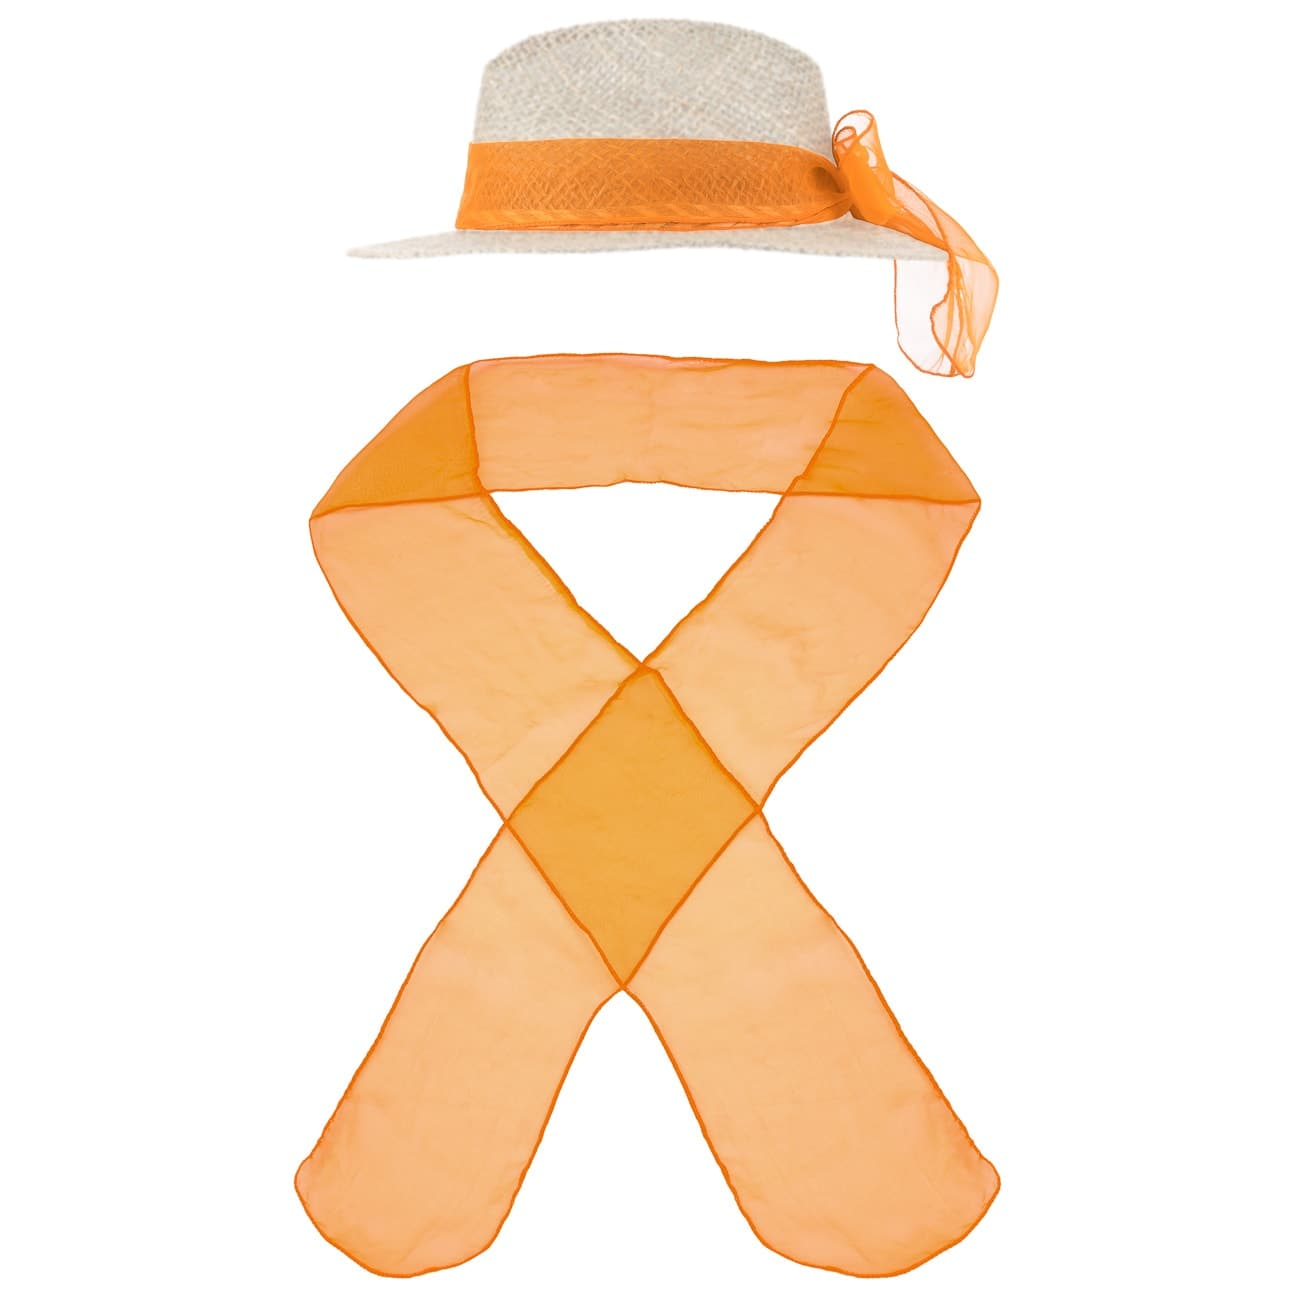 Corbata Sombrero Do It Yourself by McBURN  banda de sombrero